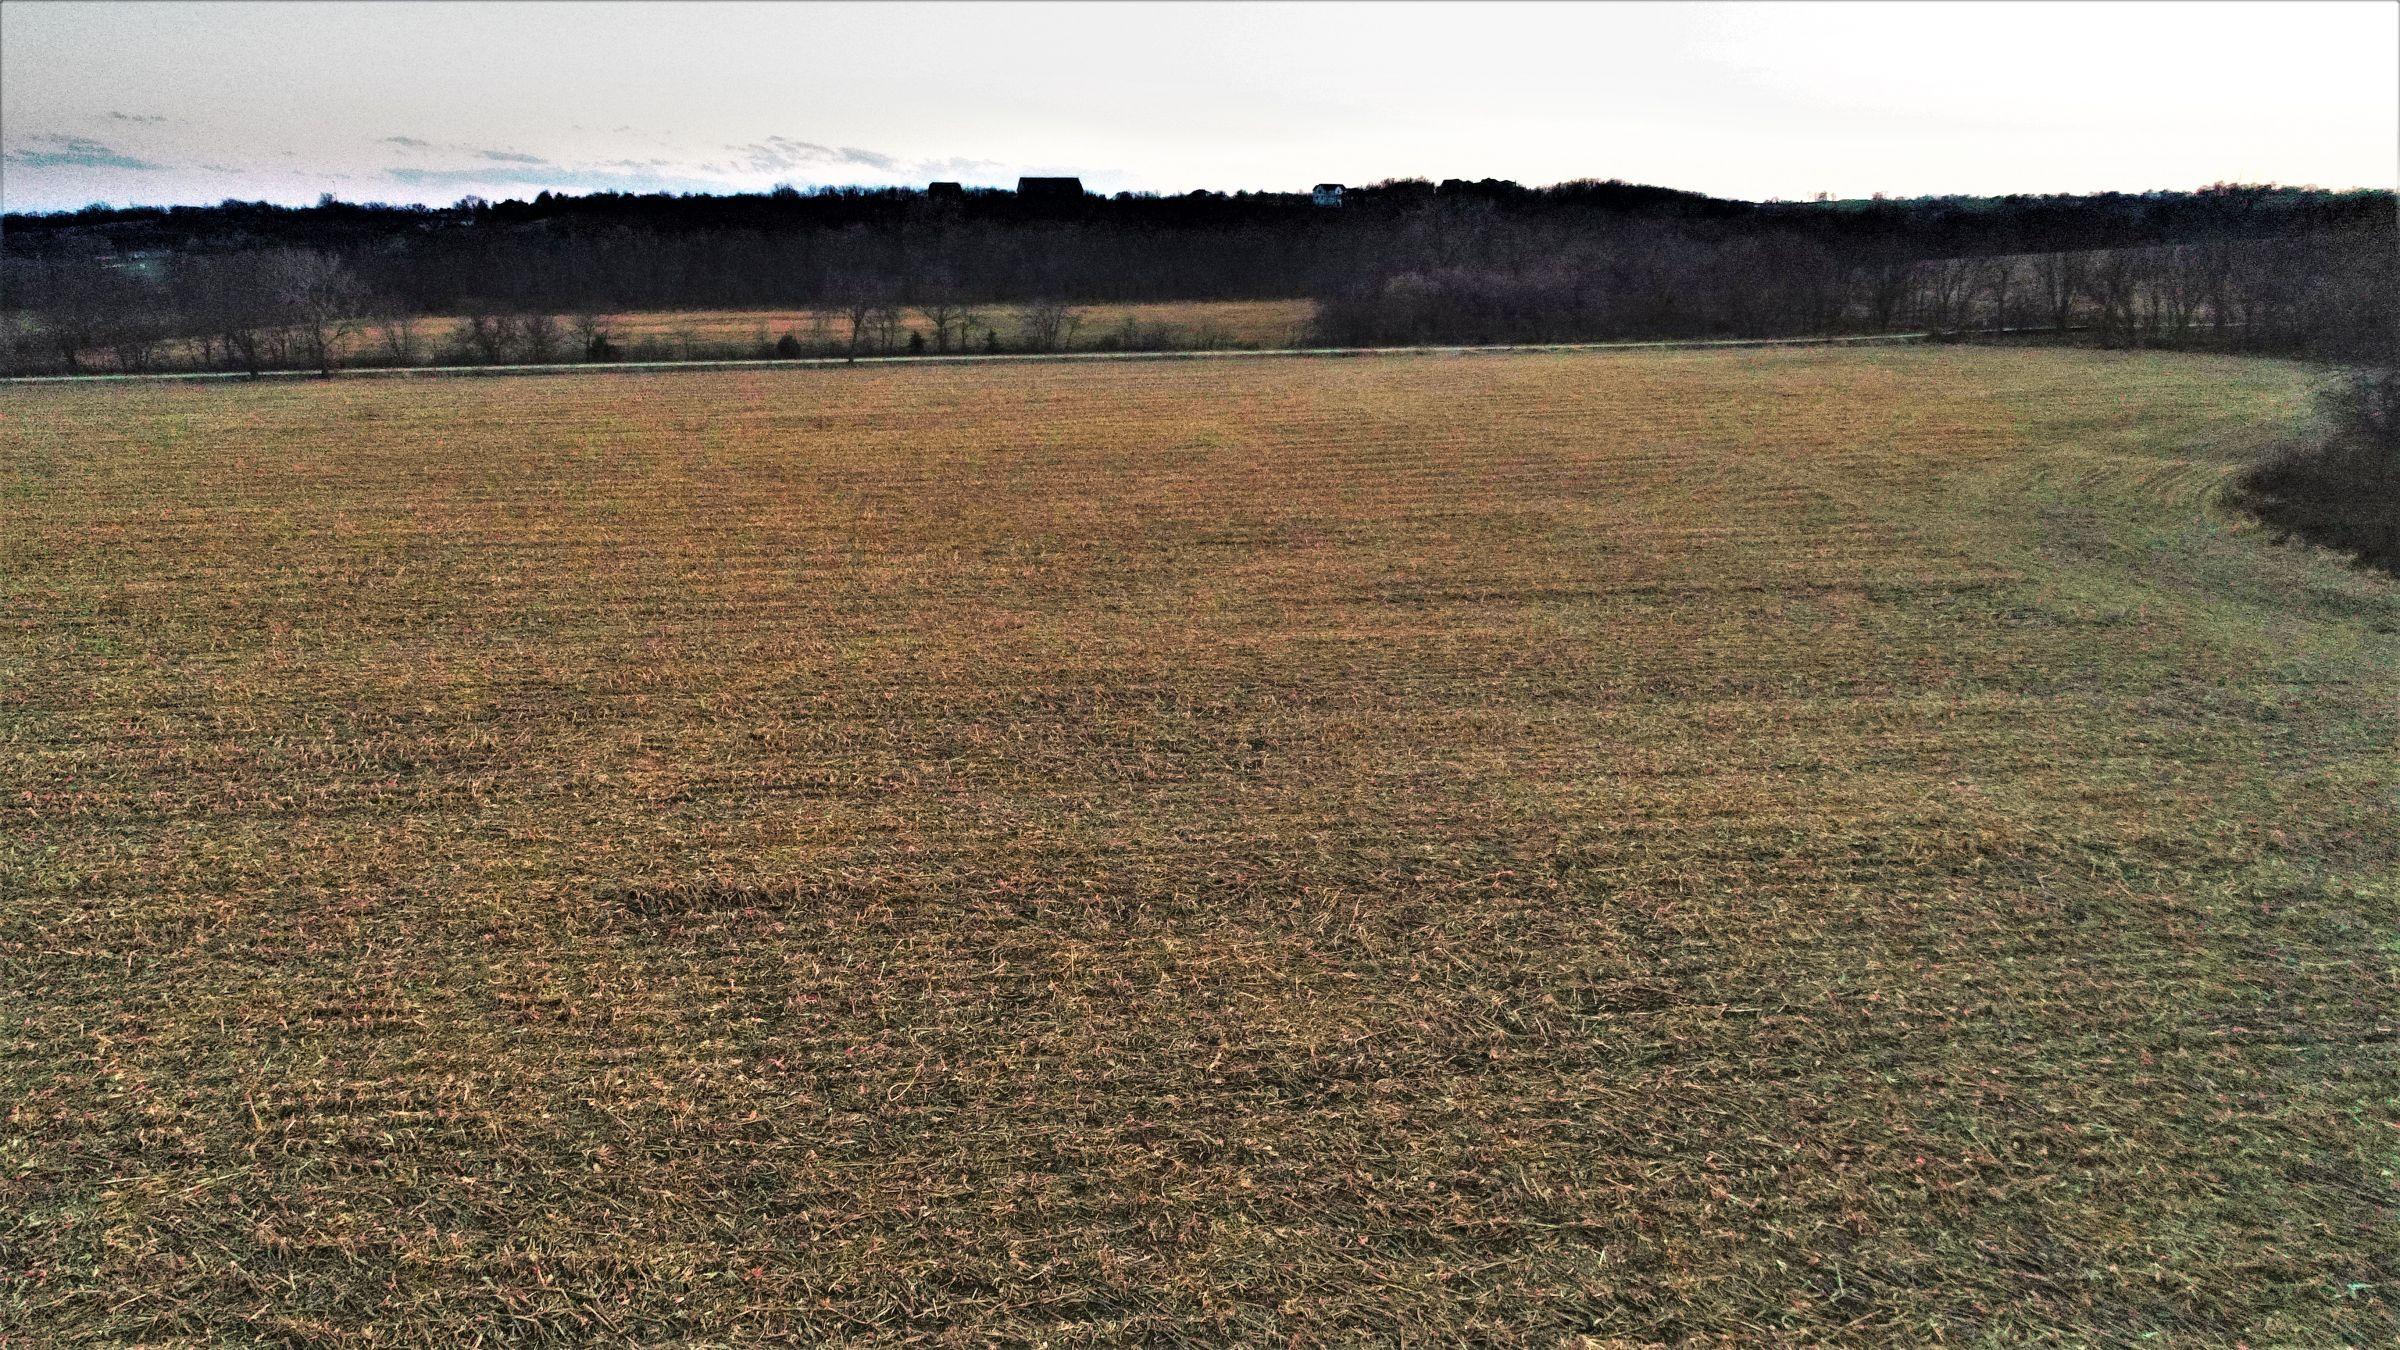 land-madison-county-iowa-20-acres-listing-number-15234-6-2020-11-10-010436.JPG